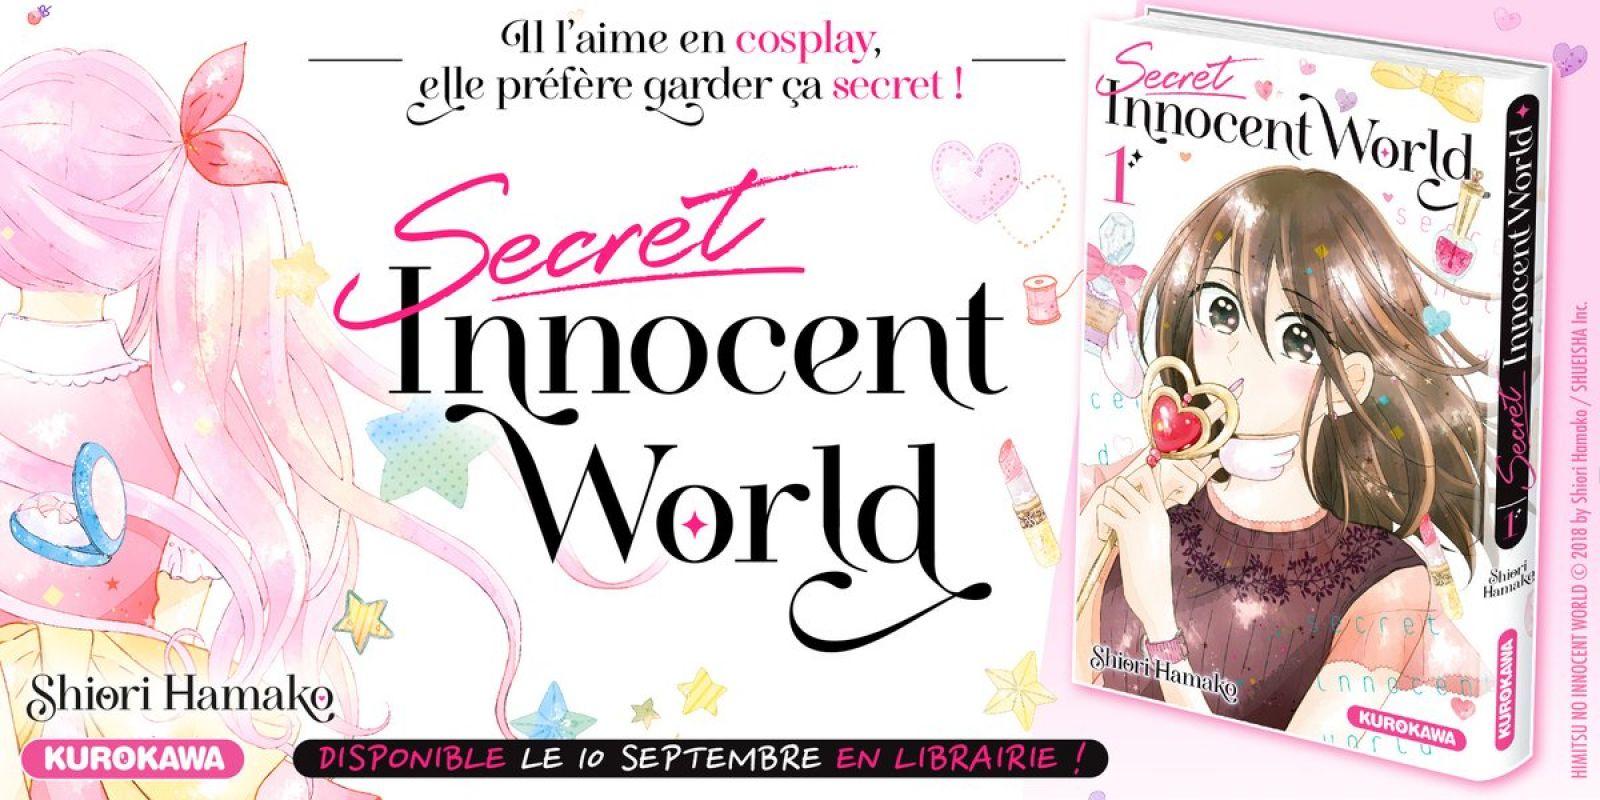 Secret Innocent World chez Kurokawa